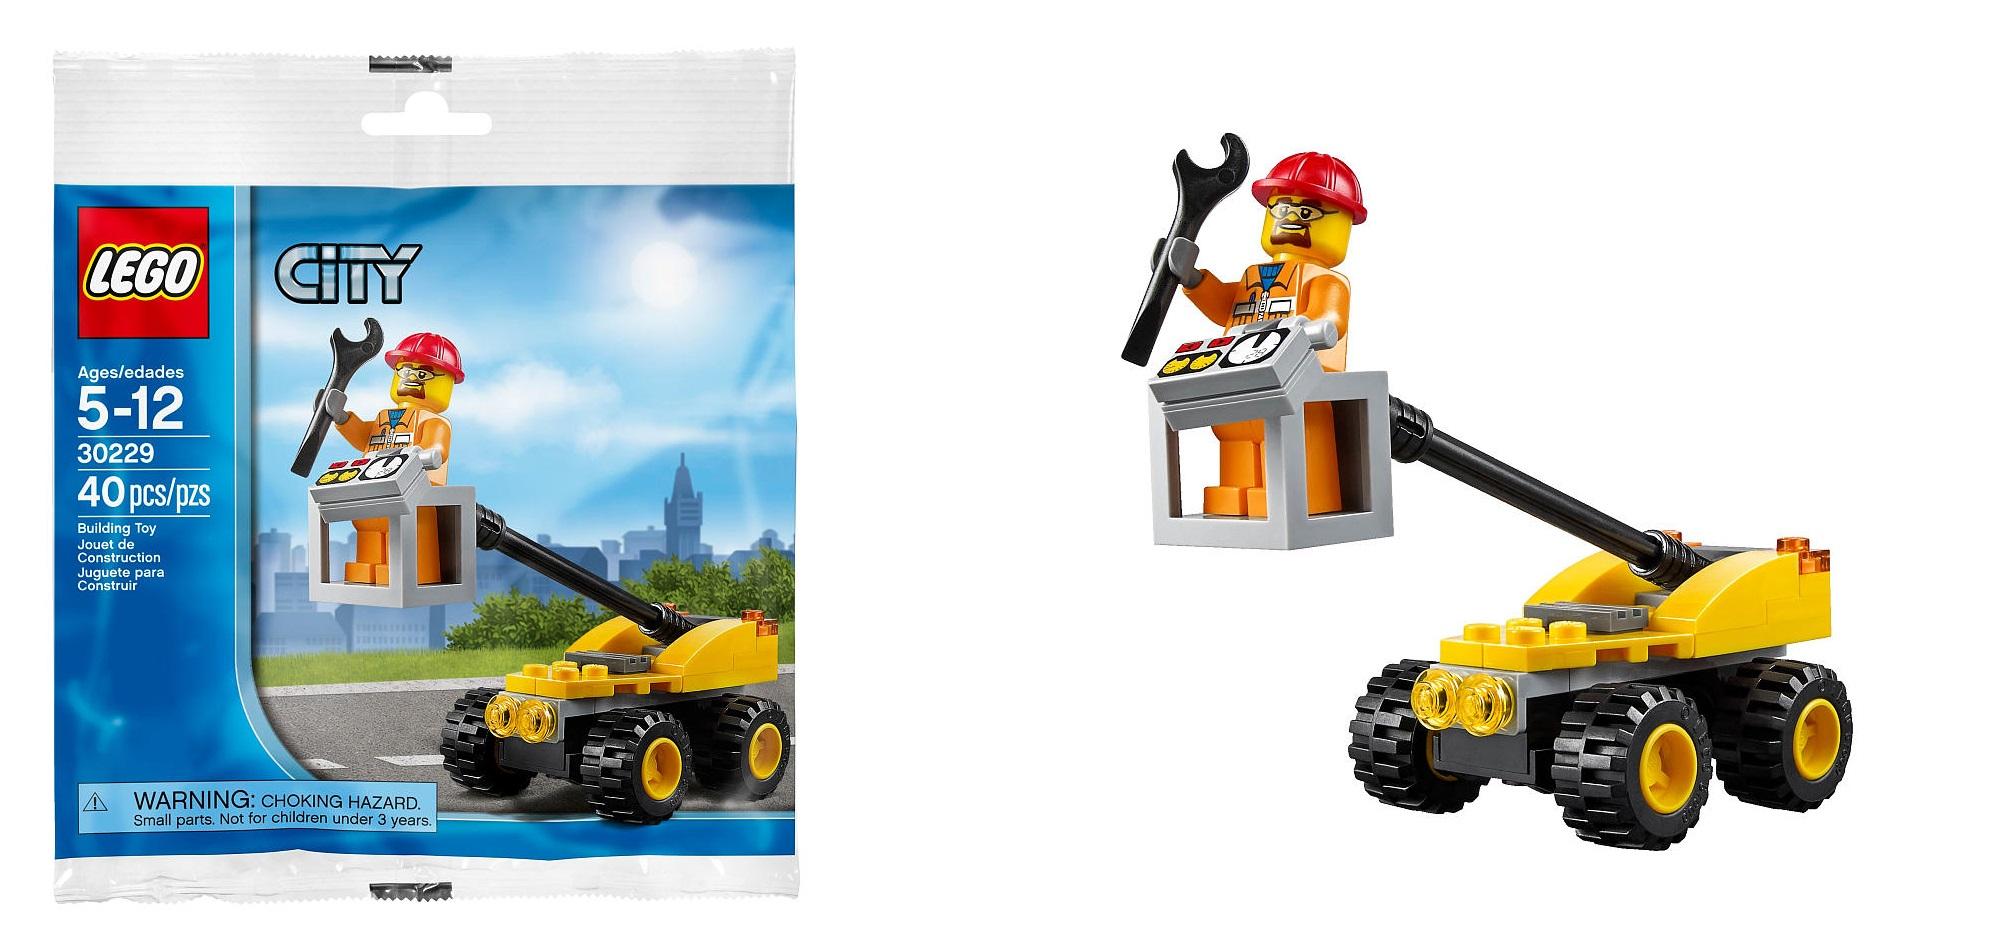 Lego City Toys : Toys n bricks lego news site sales deals reviews